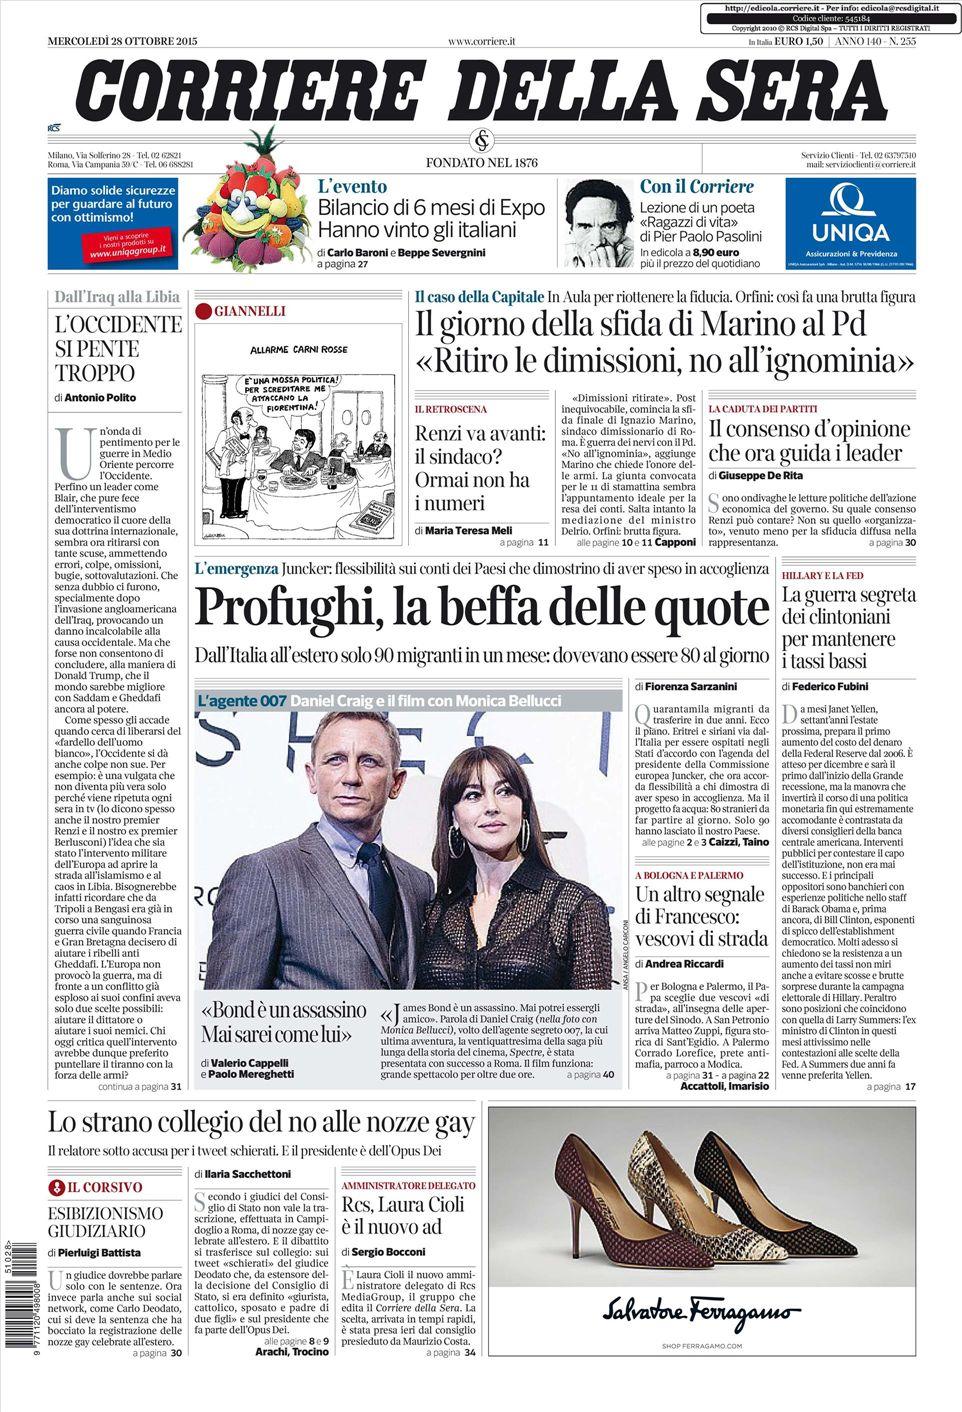 matrimoni omosessuali in italia Pordenone